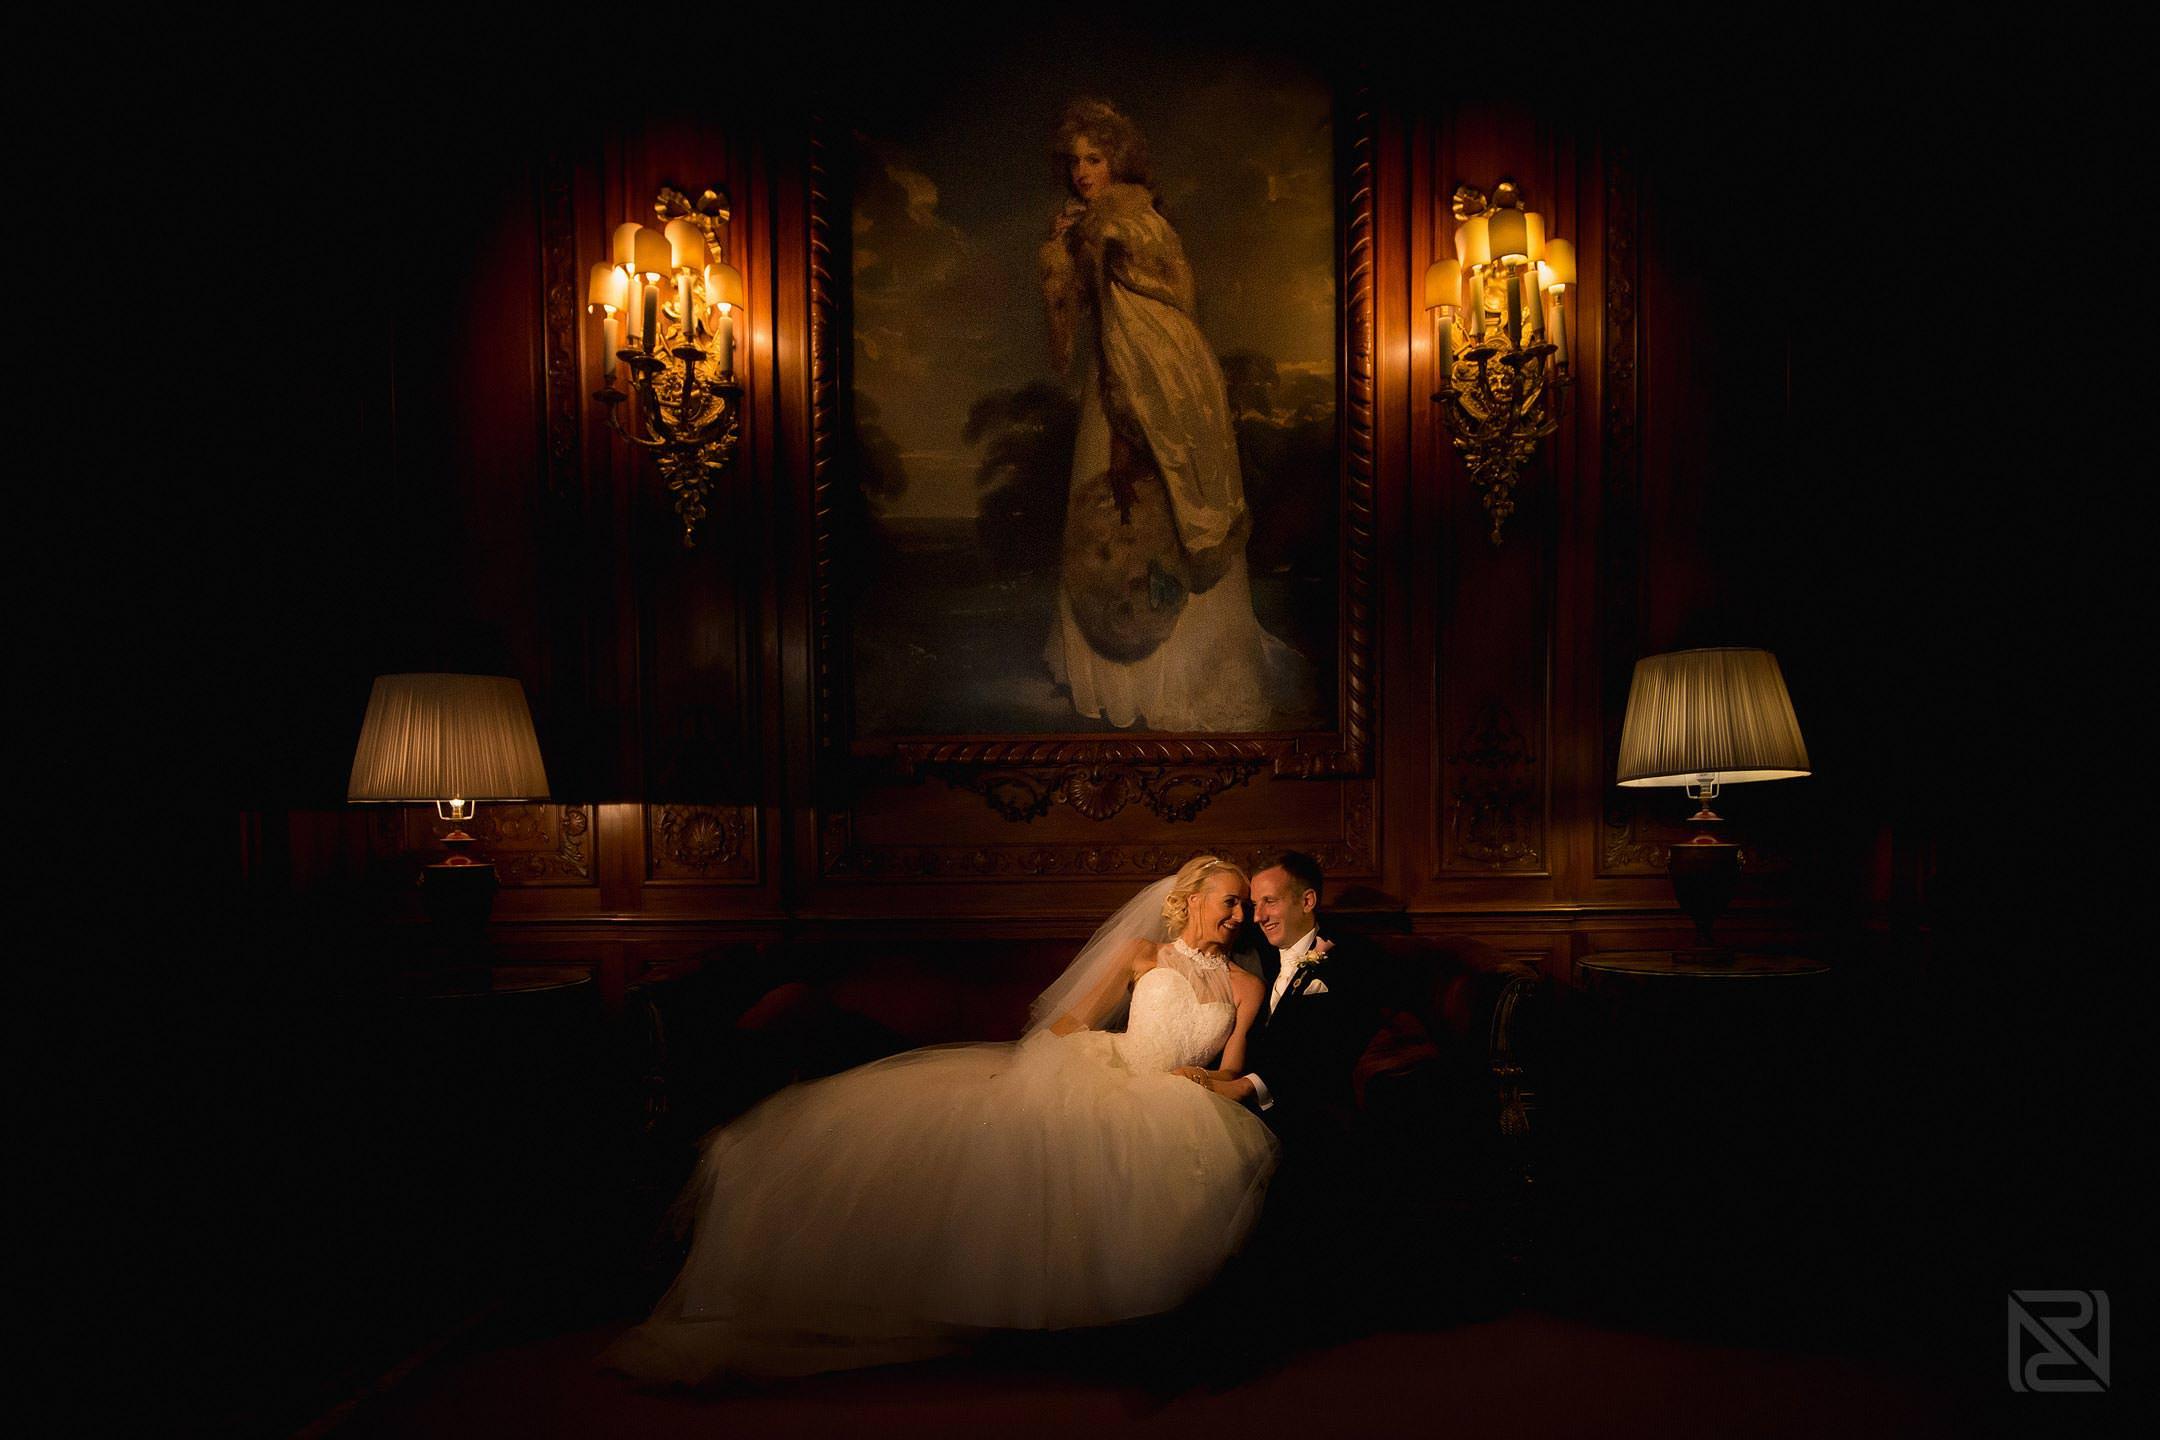 best-wedding-photographs-2015-041